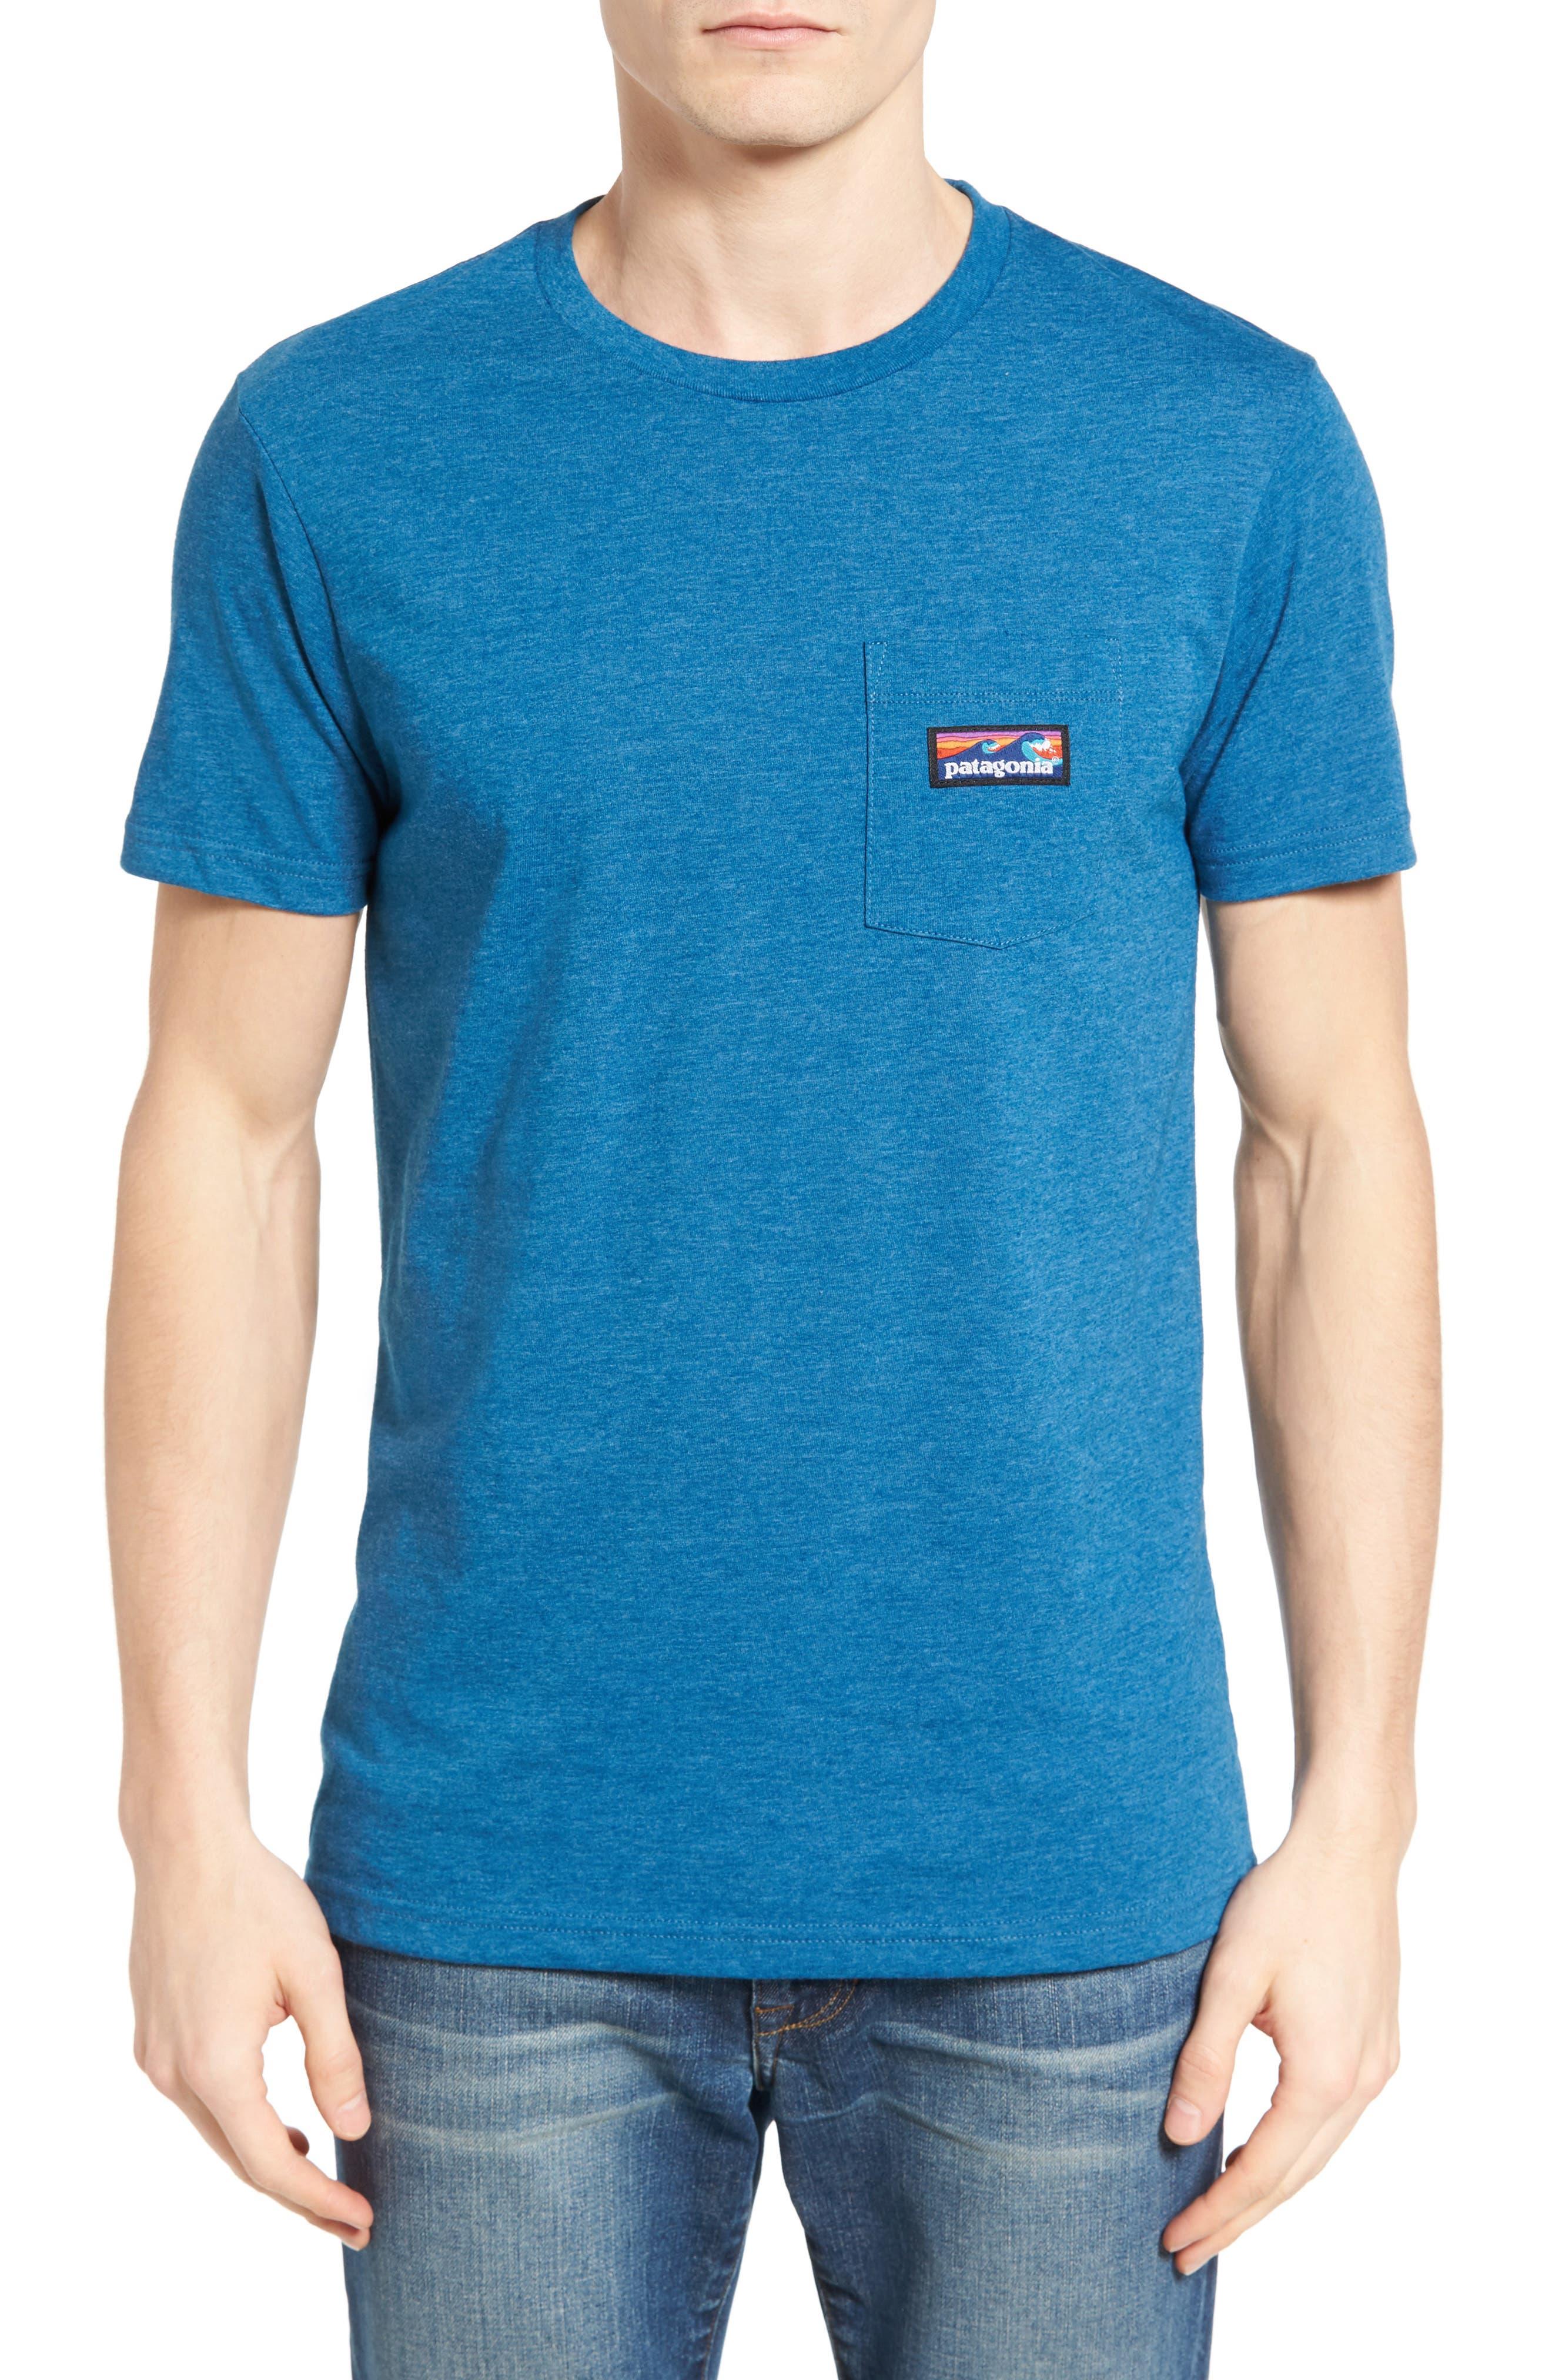 Patagonia Board Short Label T-Shirt